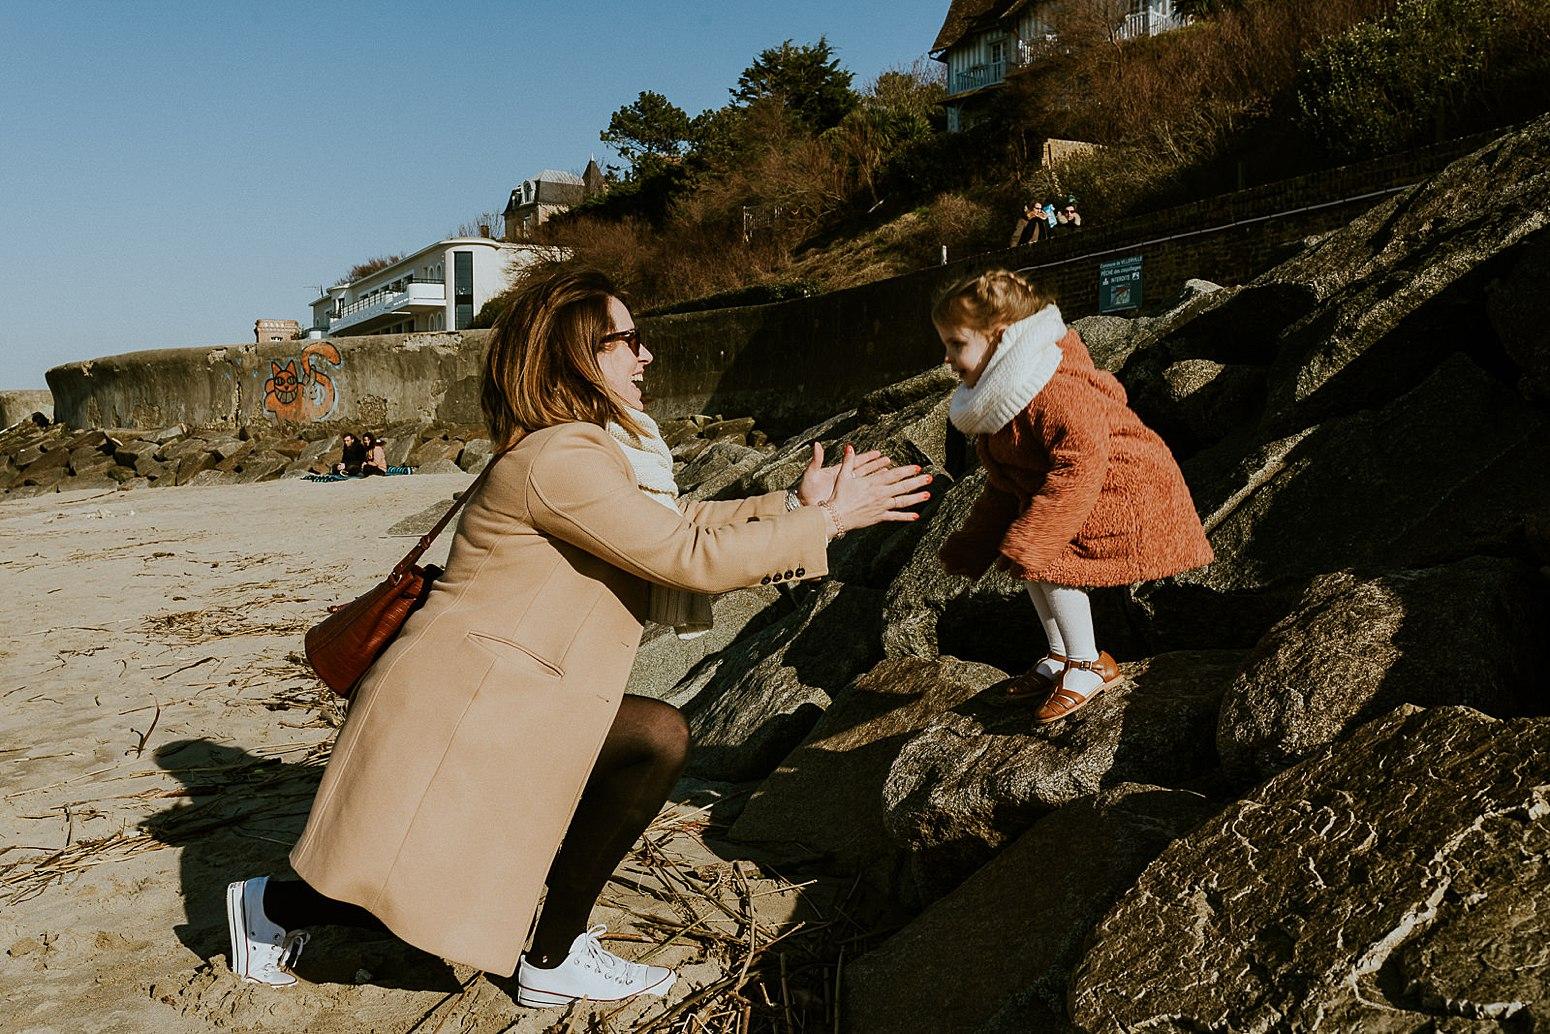 photographe-famille-normandie-plage_0007.jpg